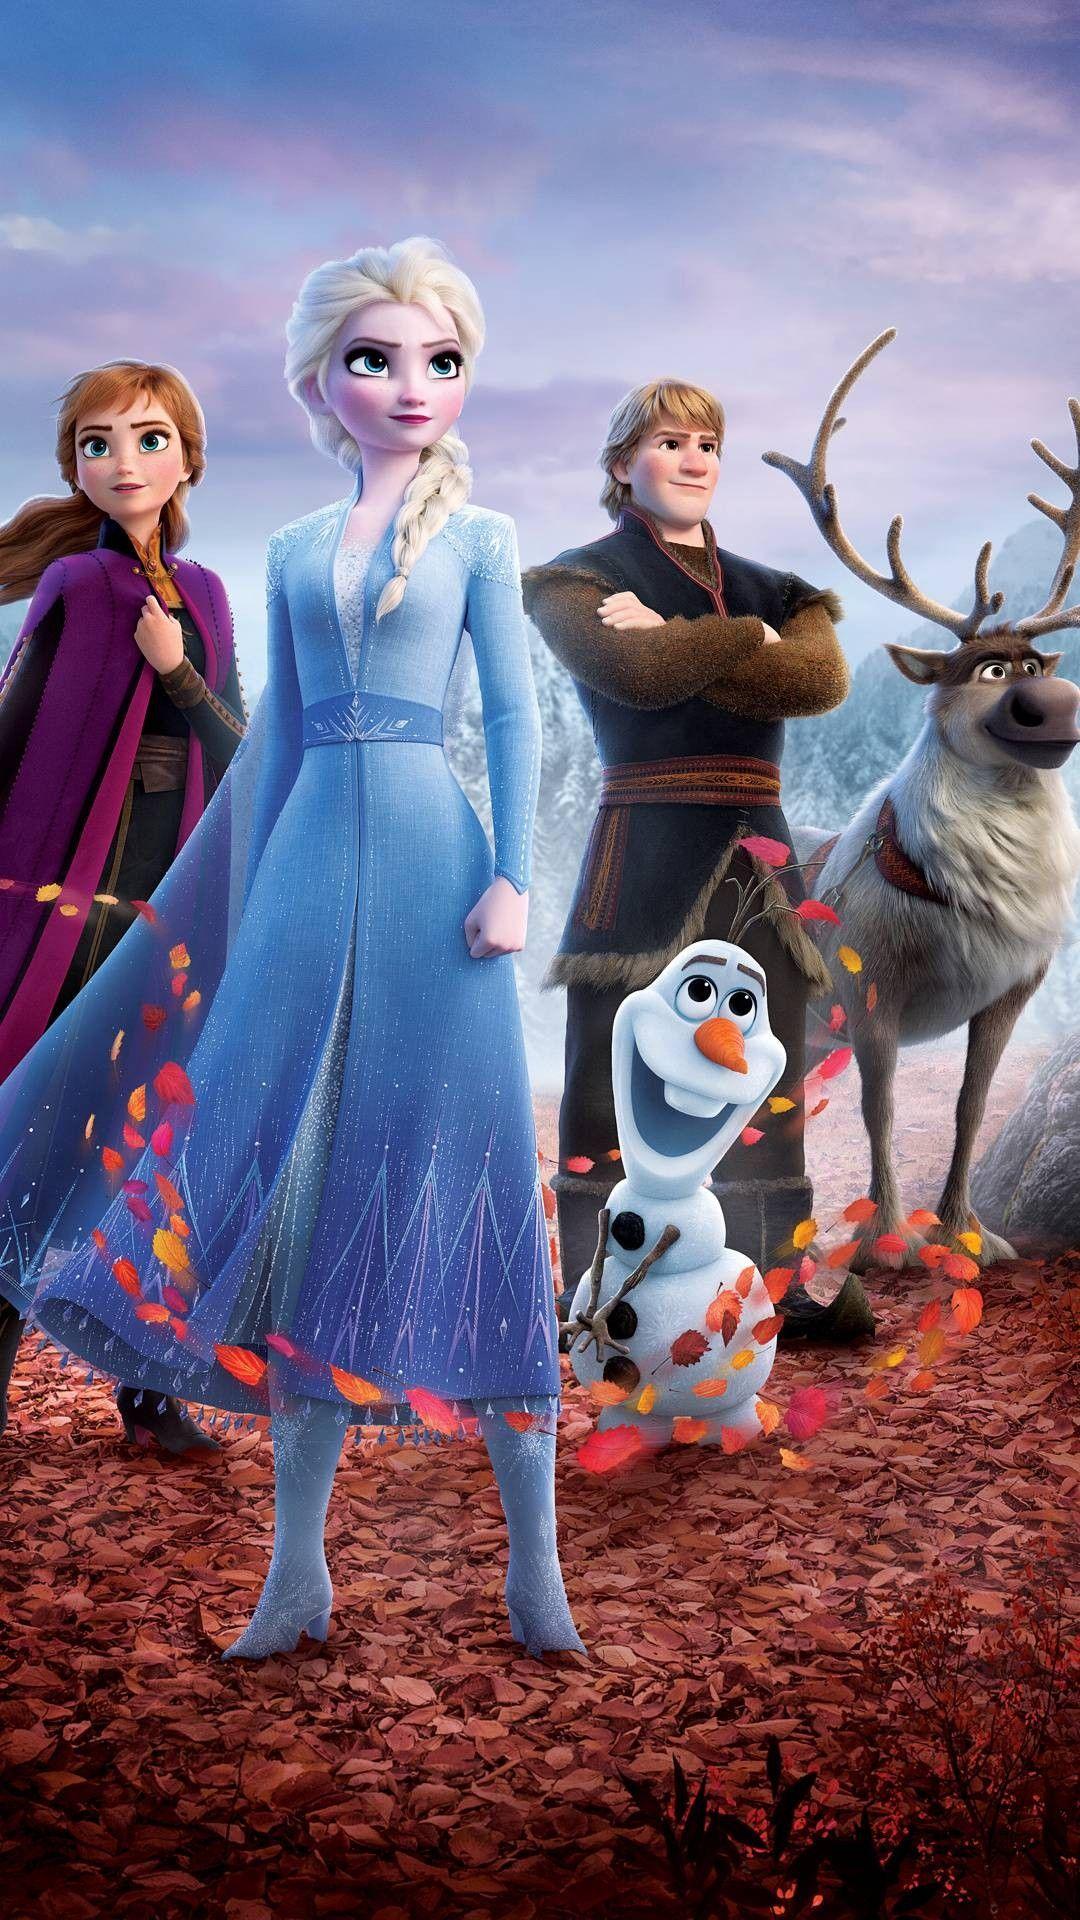 Pin De Arsh Ansari Em Pho 8 Ga R Personagens Frozen Fotos Da Frozen Filme Frozen